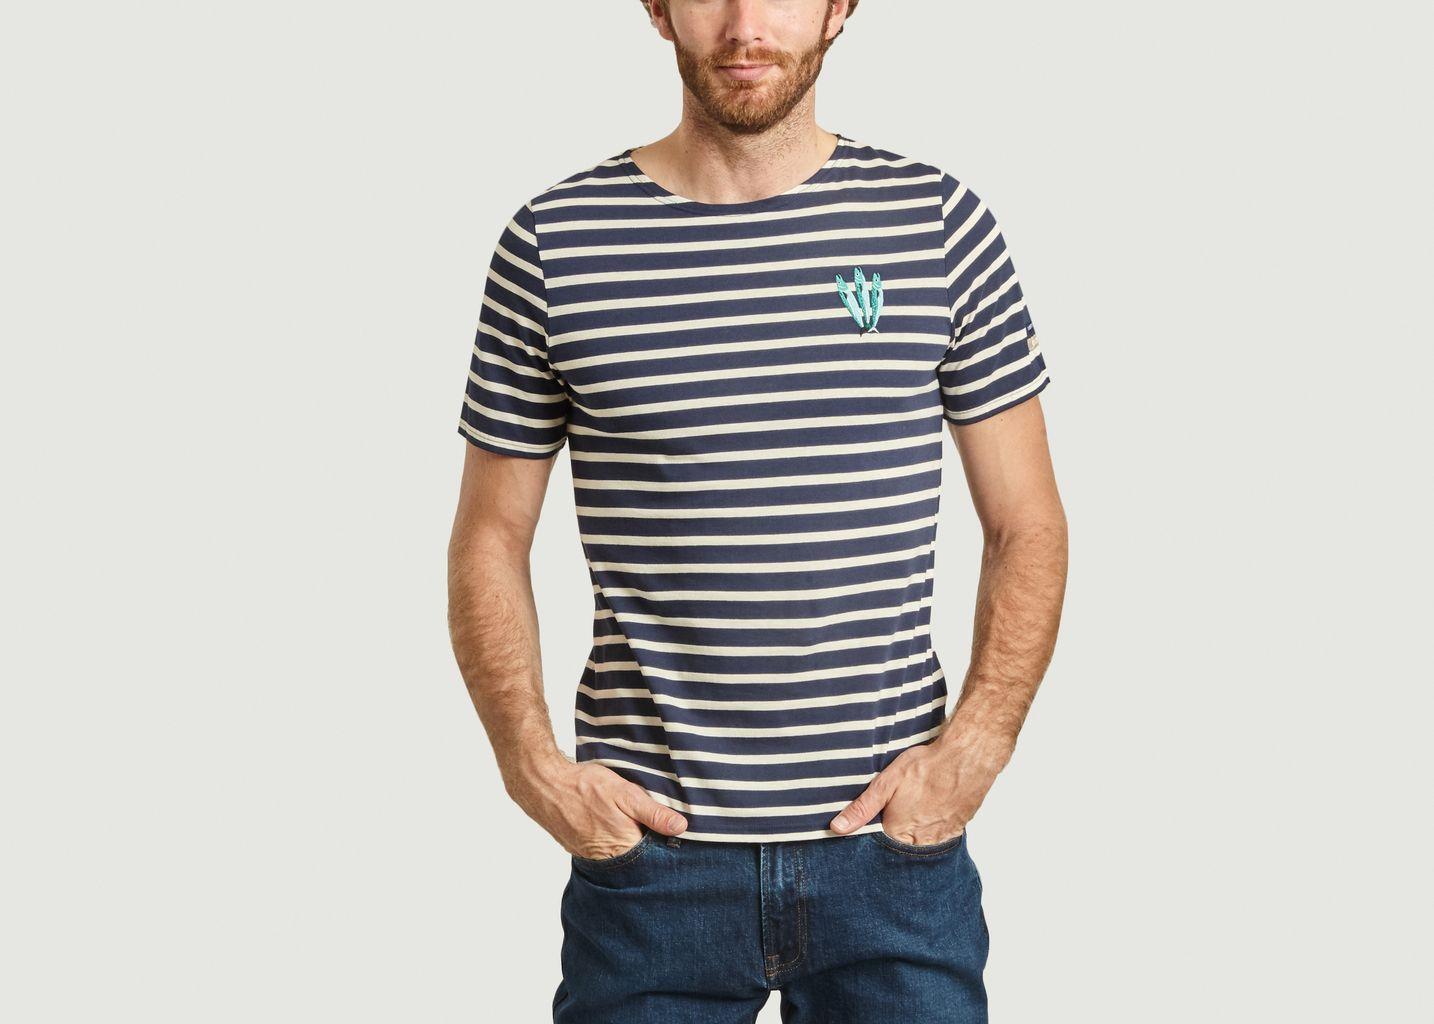 T-shirt rayé brodé Sardines Olow x Saint James - Olow